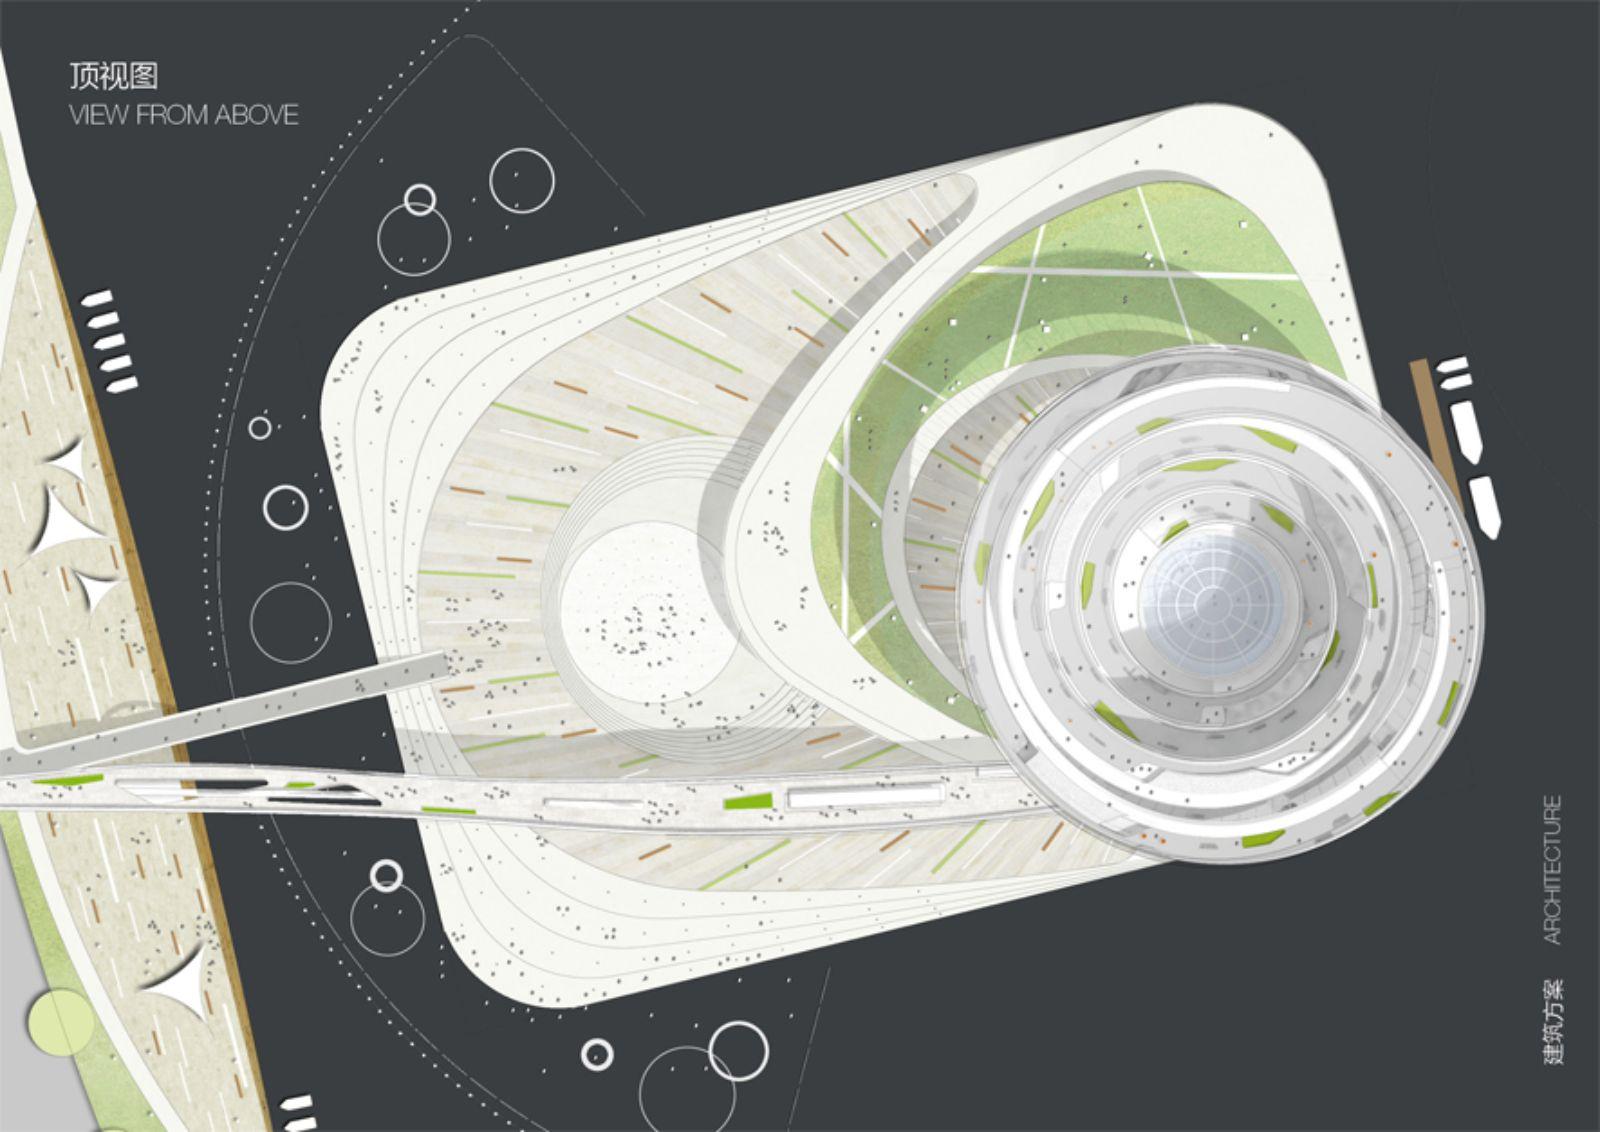 12-KSP-wins-the-Meixi-Urban-Helix-competition